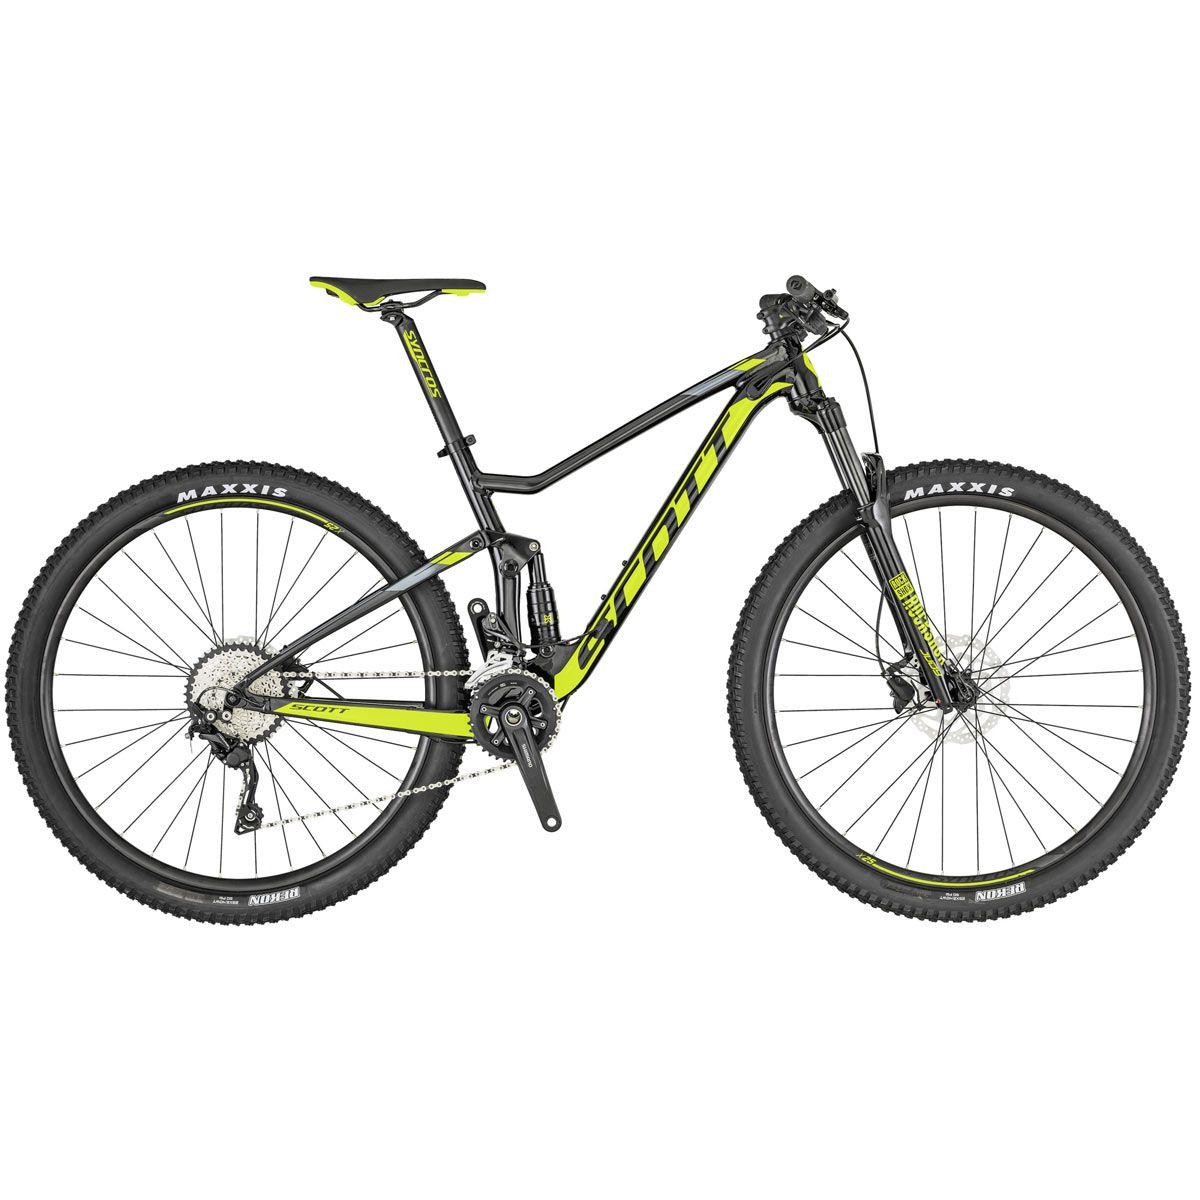 Bicicleta Scott Spark 970 Aro 29